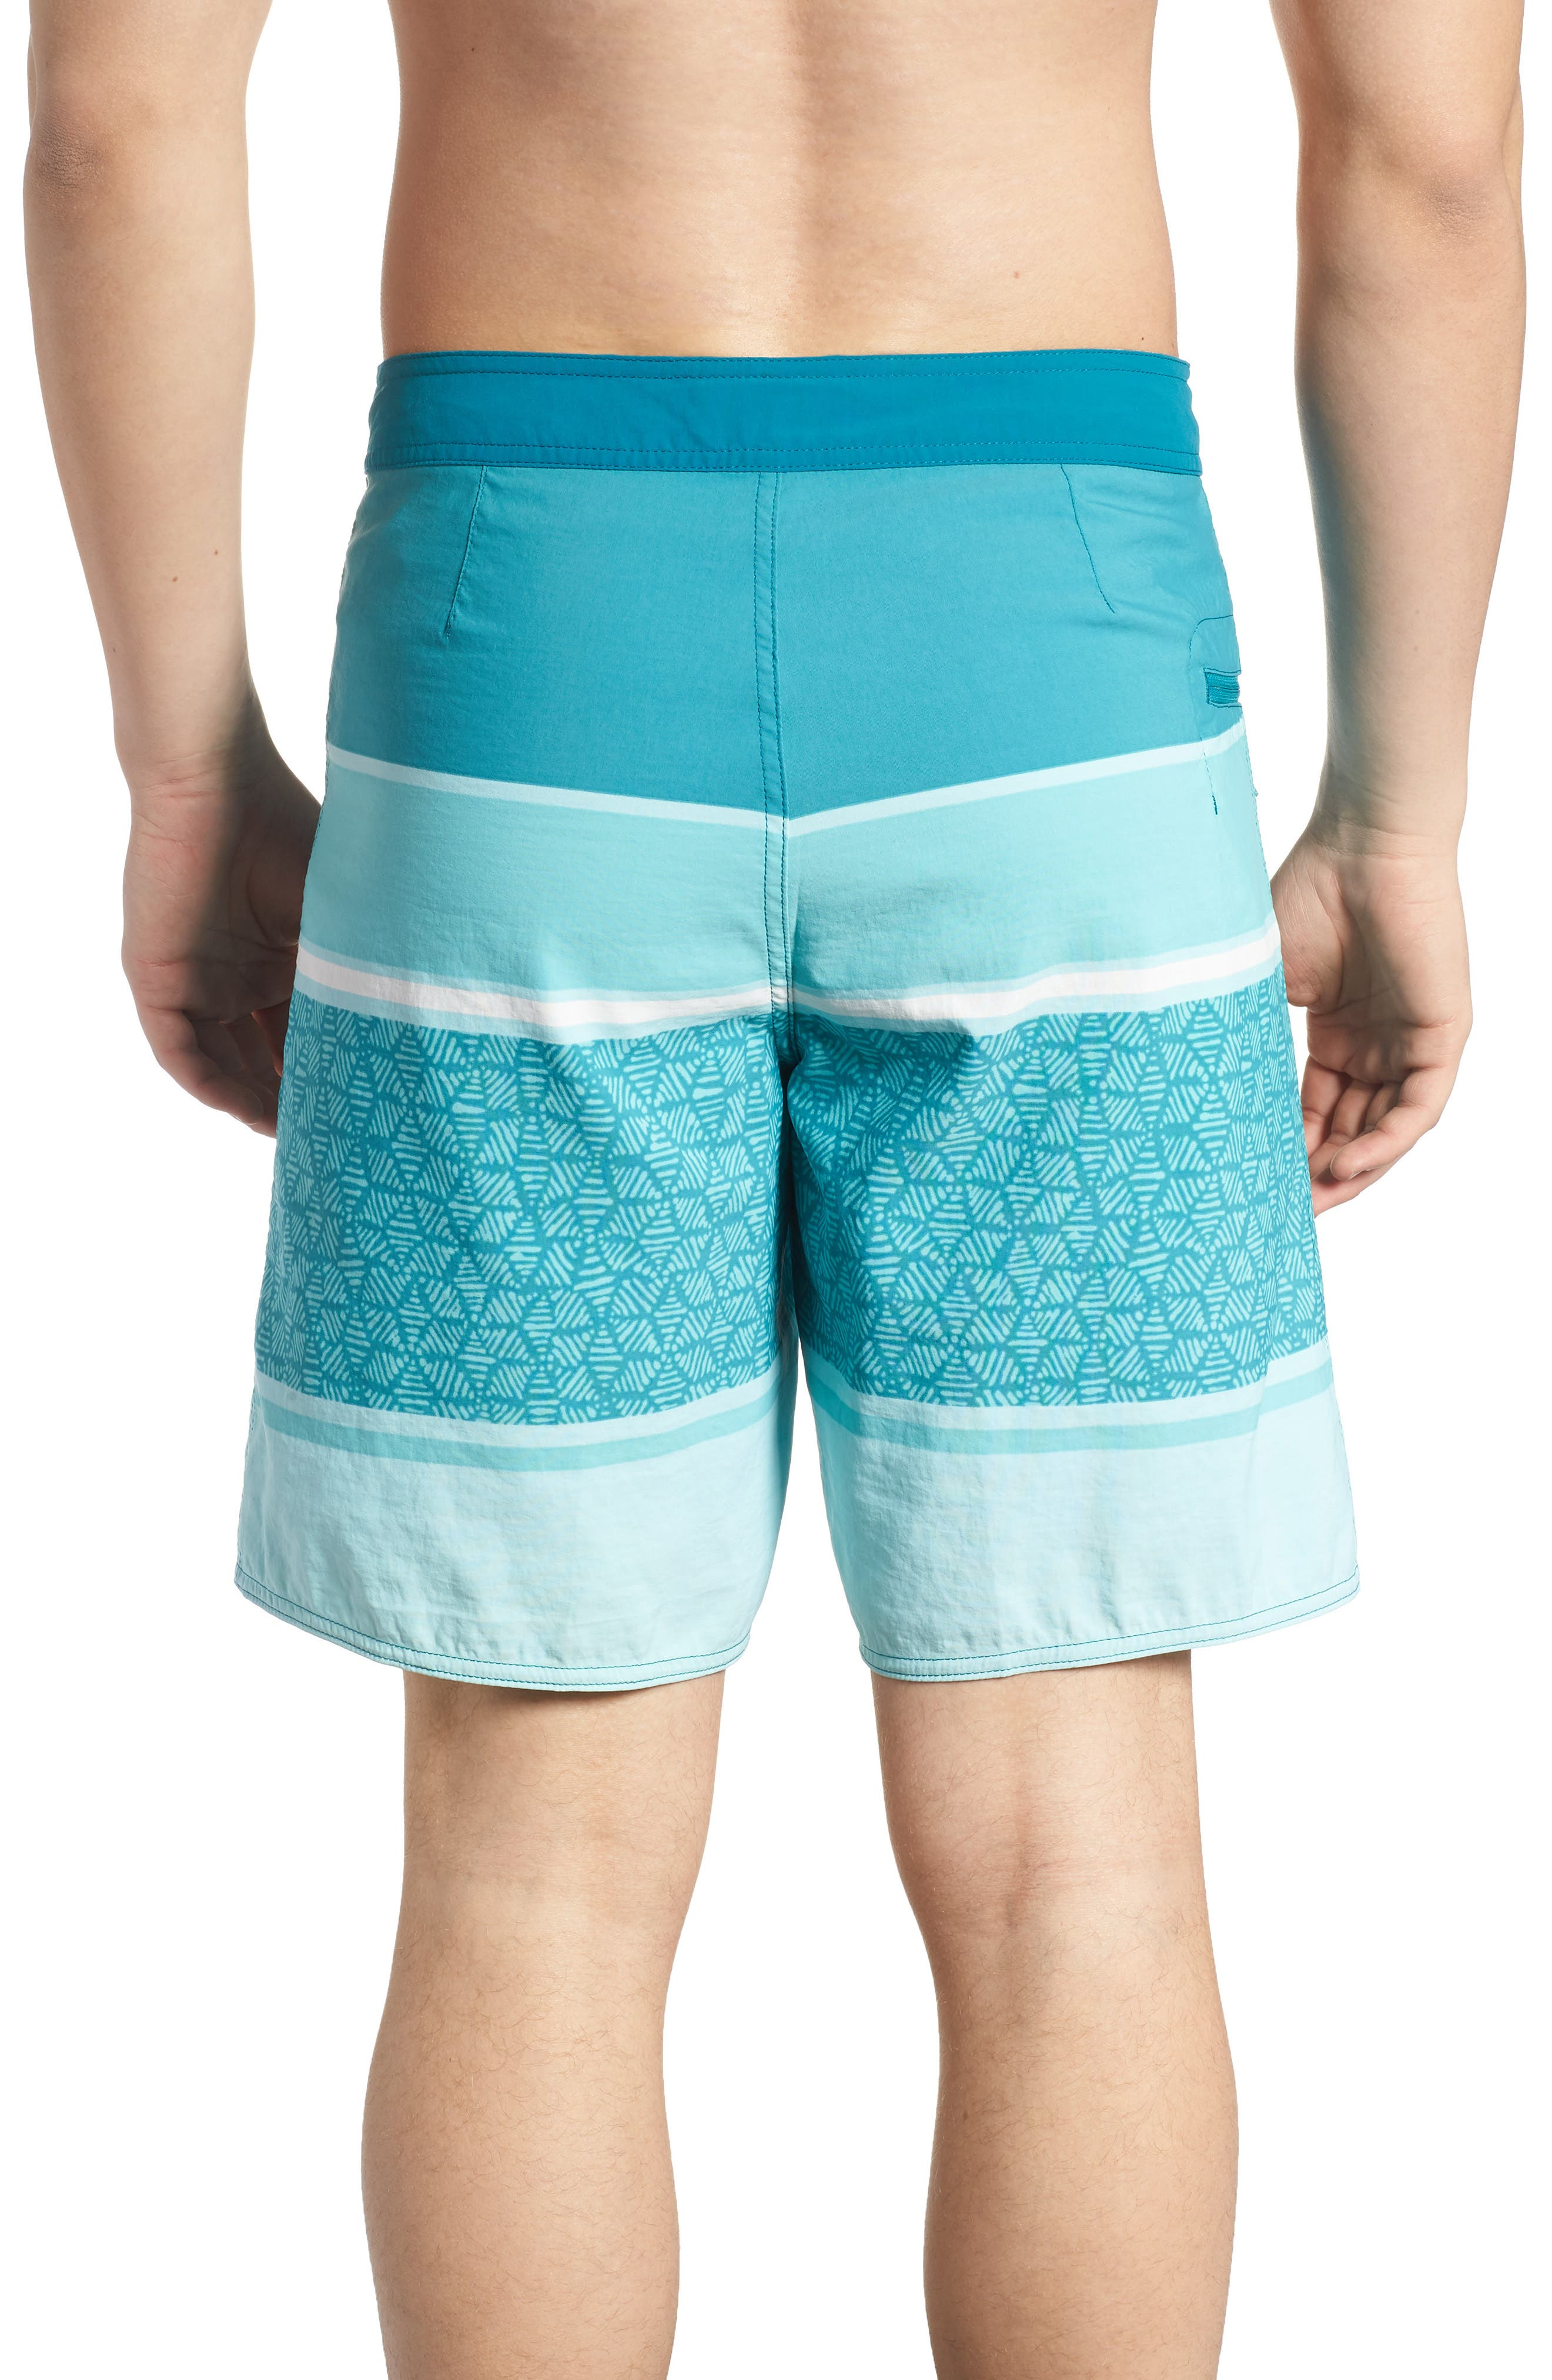 Wavefarer Board Shorts,                             Alternate thumbnail 2, color,                             Batik Hex Stripe Bend Blue